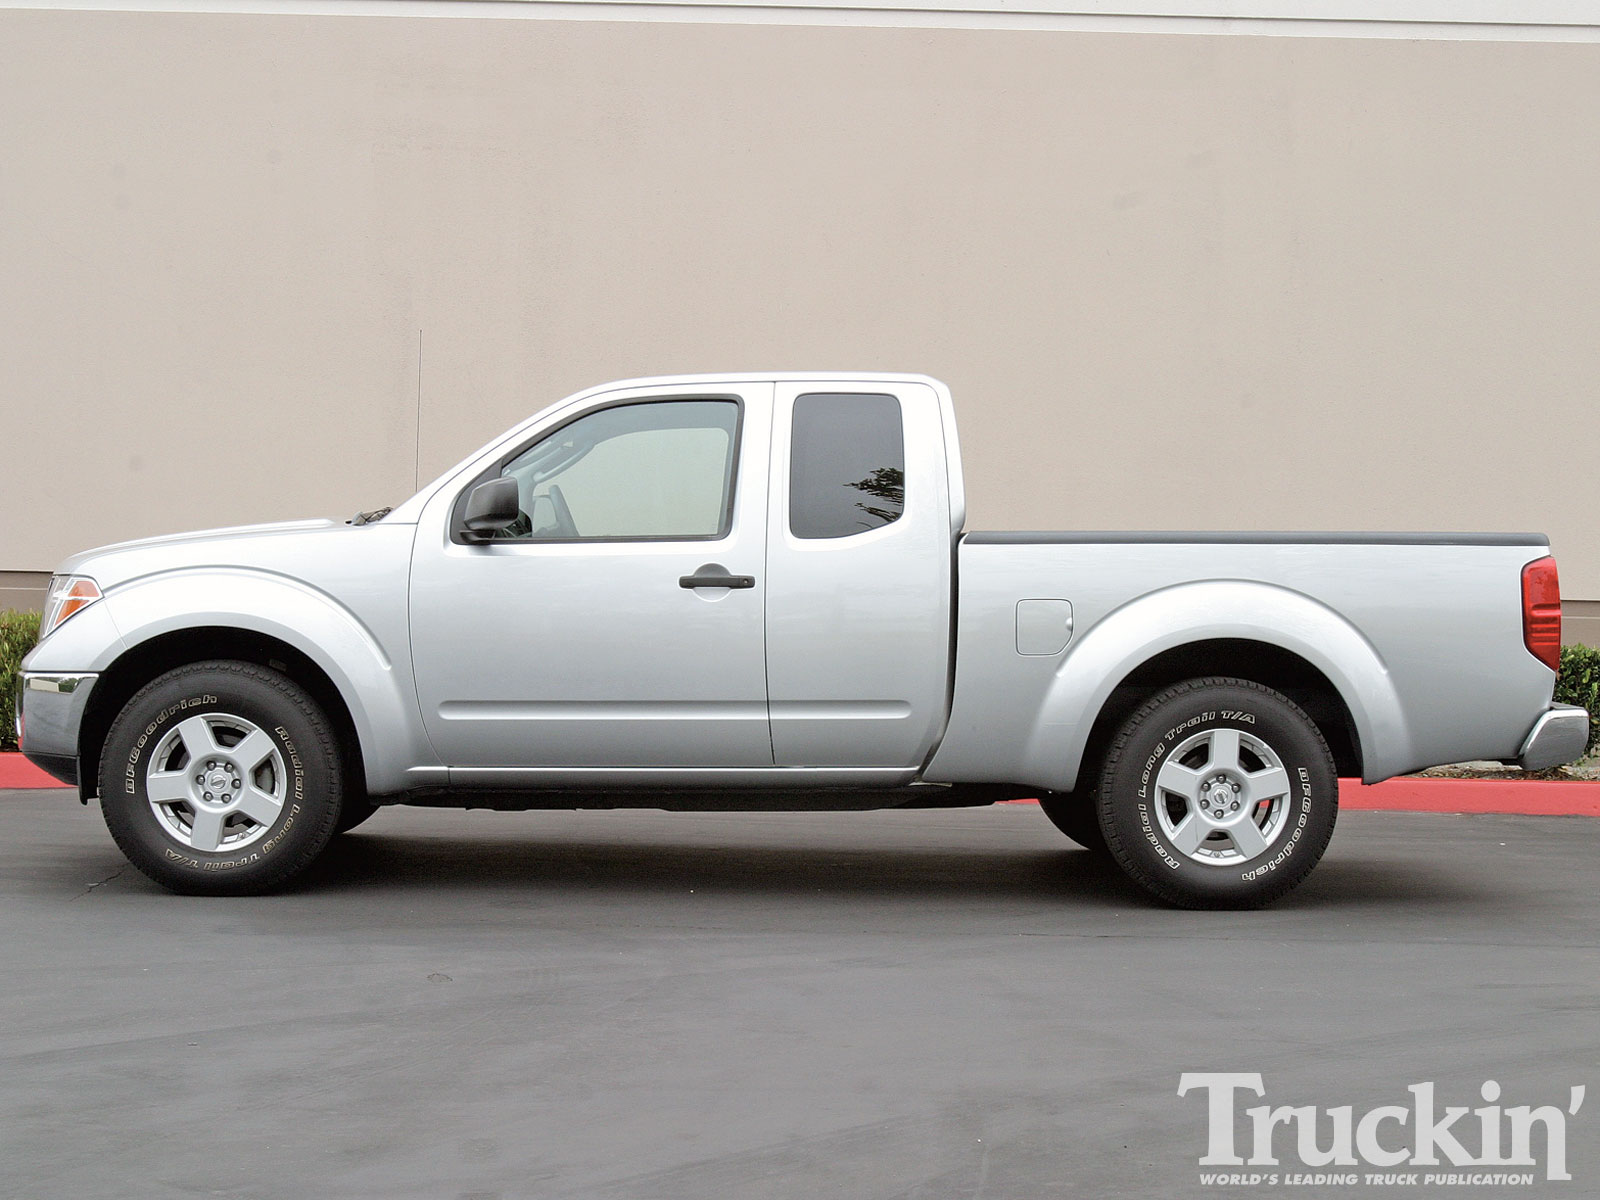 2006 Nissan Frontier Buildup Daystar 2 Inch Leveling Kit Truckin